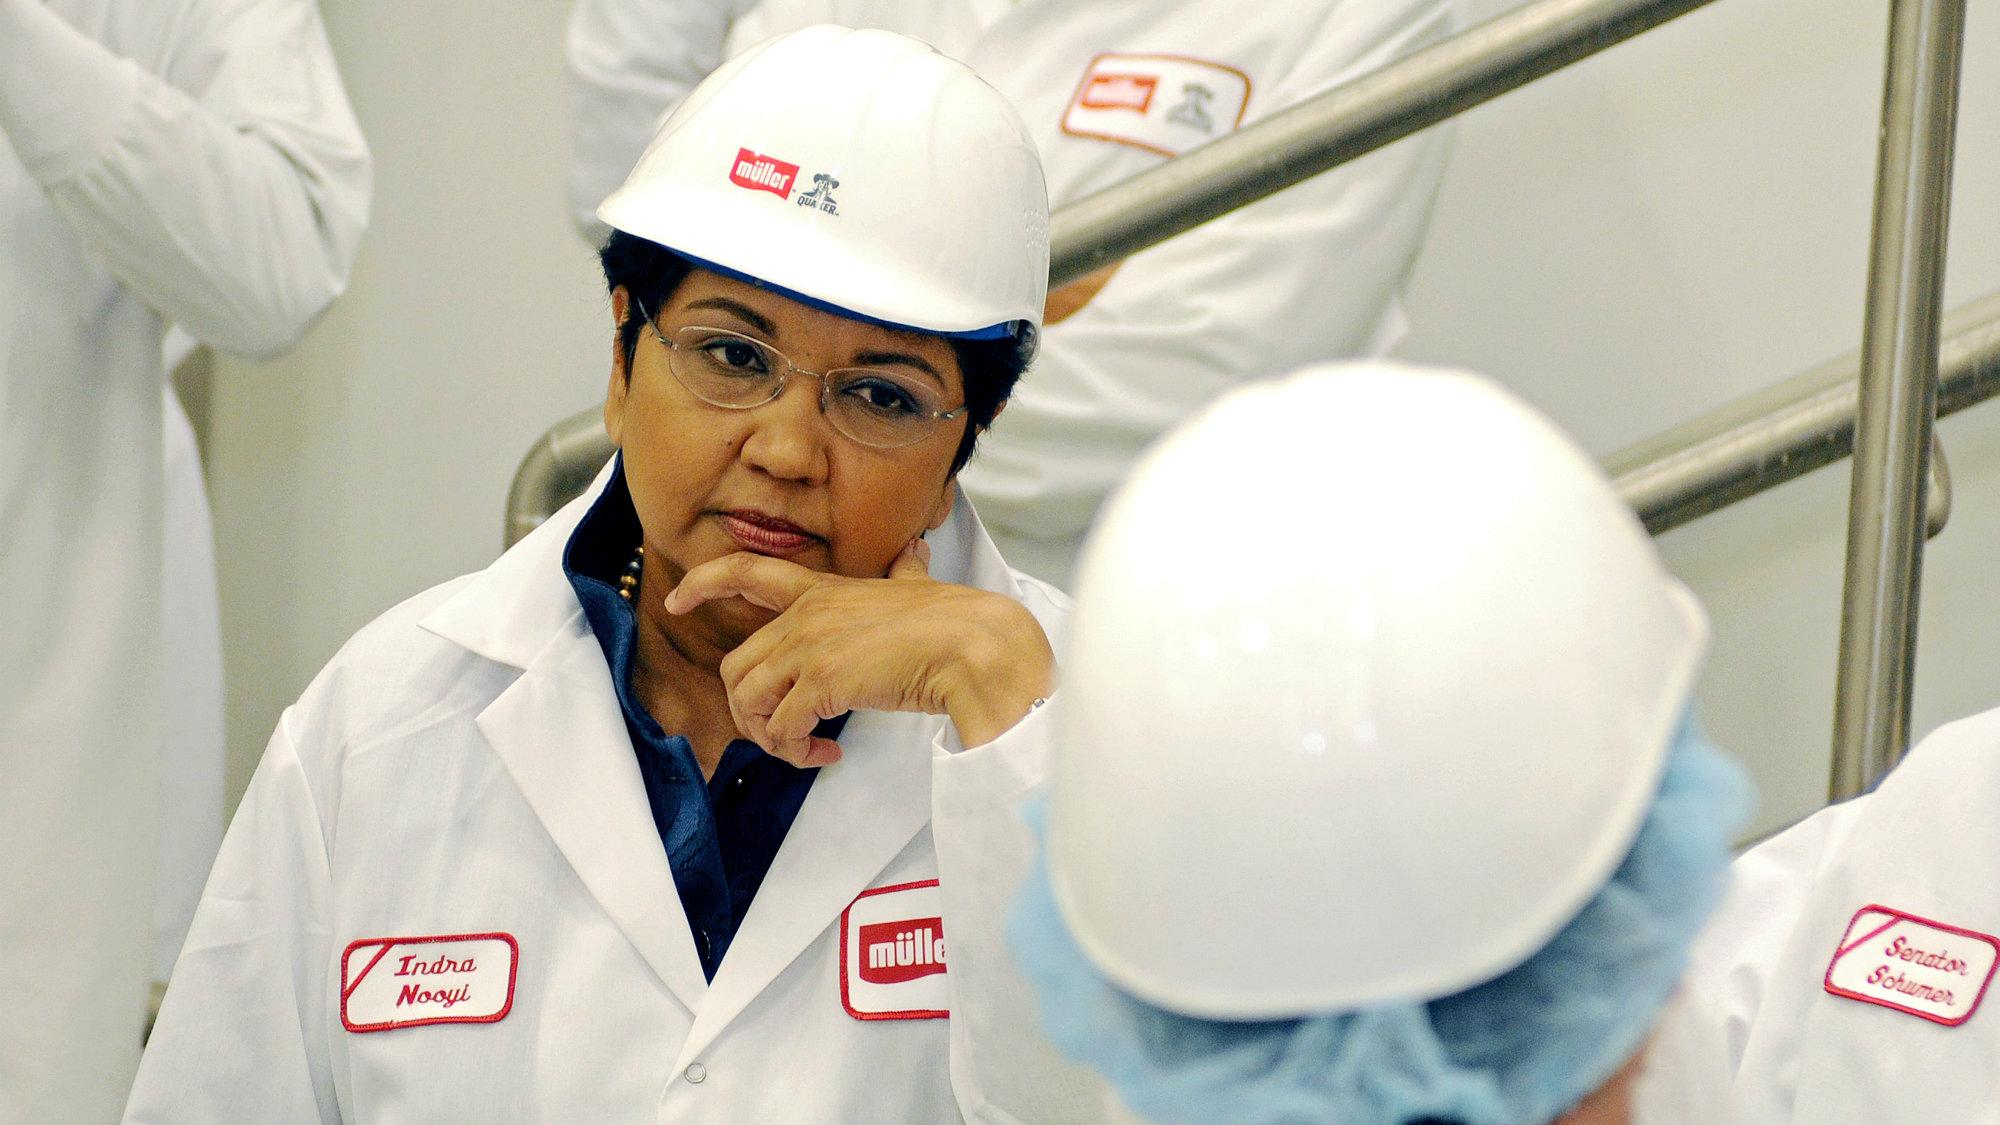 PepsiCo CEO Indra Nooyi at the Muller Quaker dairy facility in Batavia